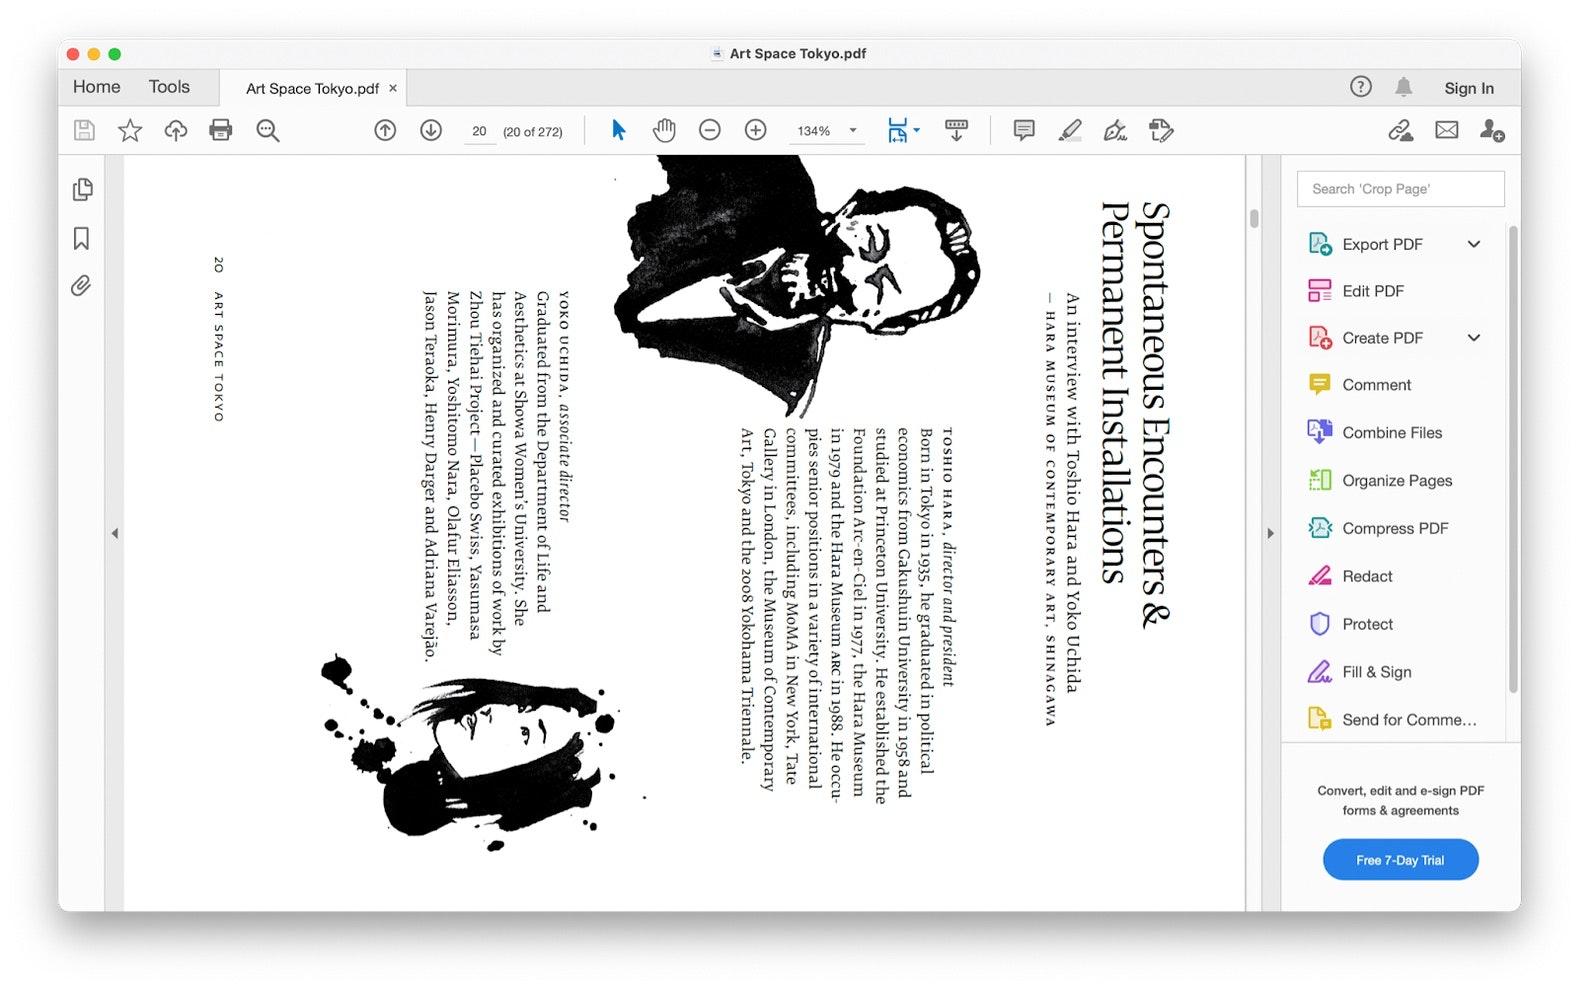 rotate PDFs via Adobe Acrobat